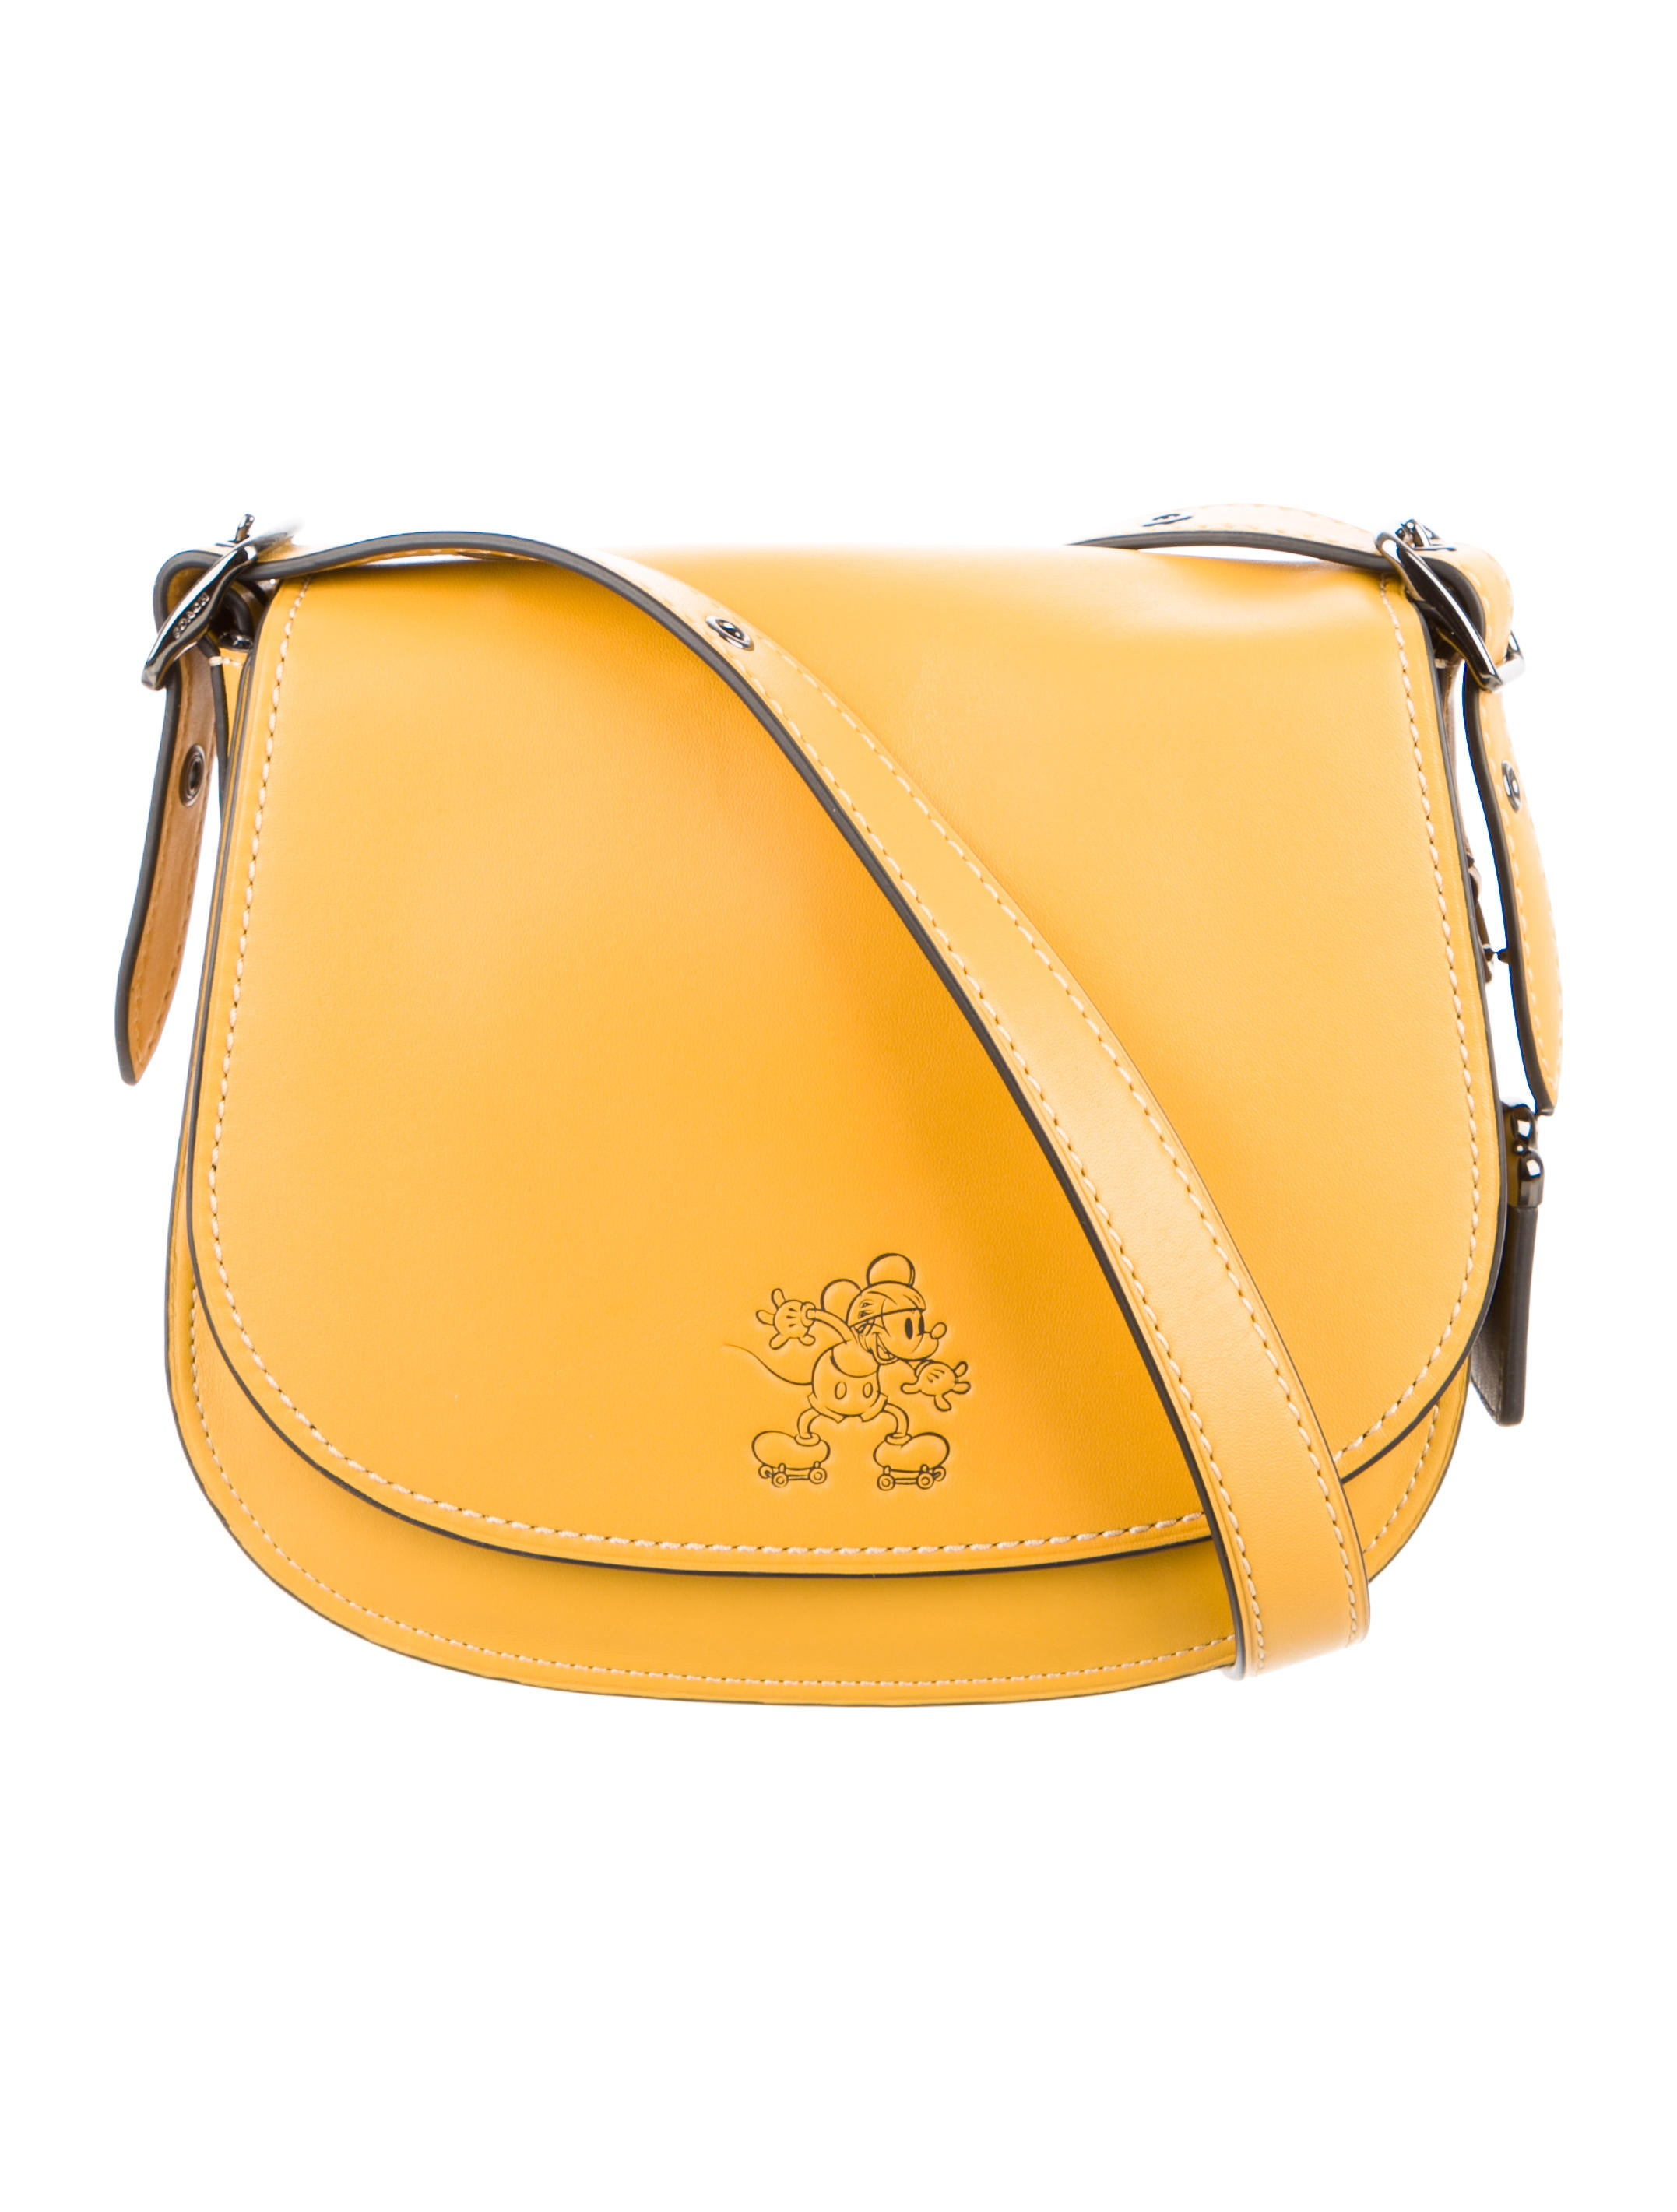 foldover logo shoulder bag - Yellow & Orange Coach Sw3o1